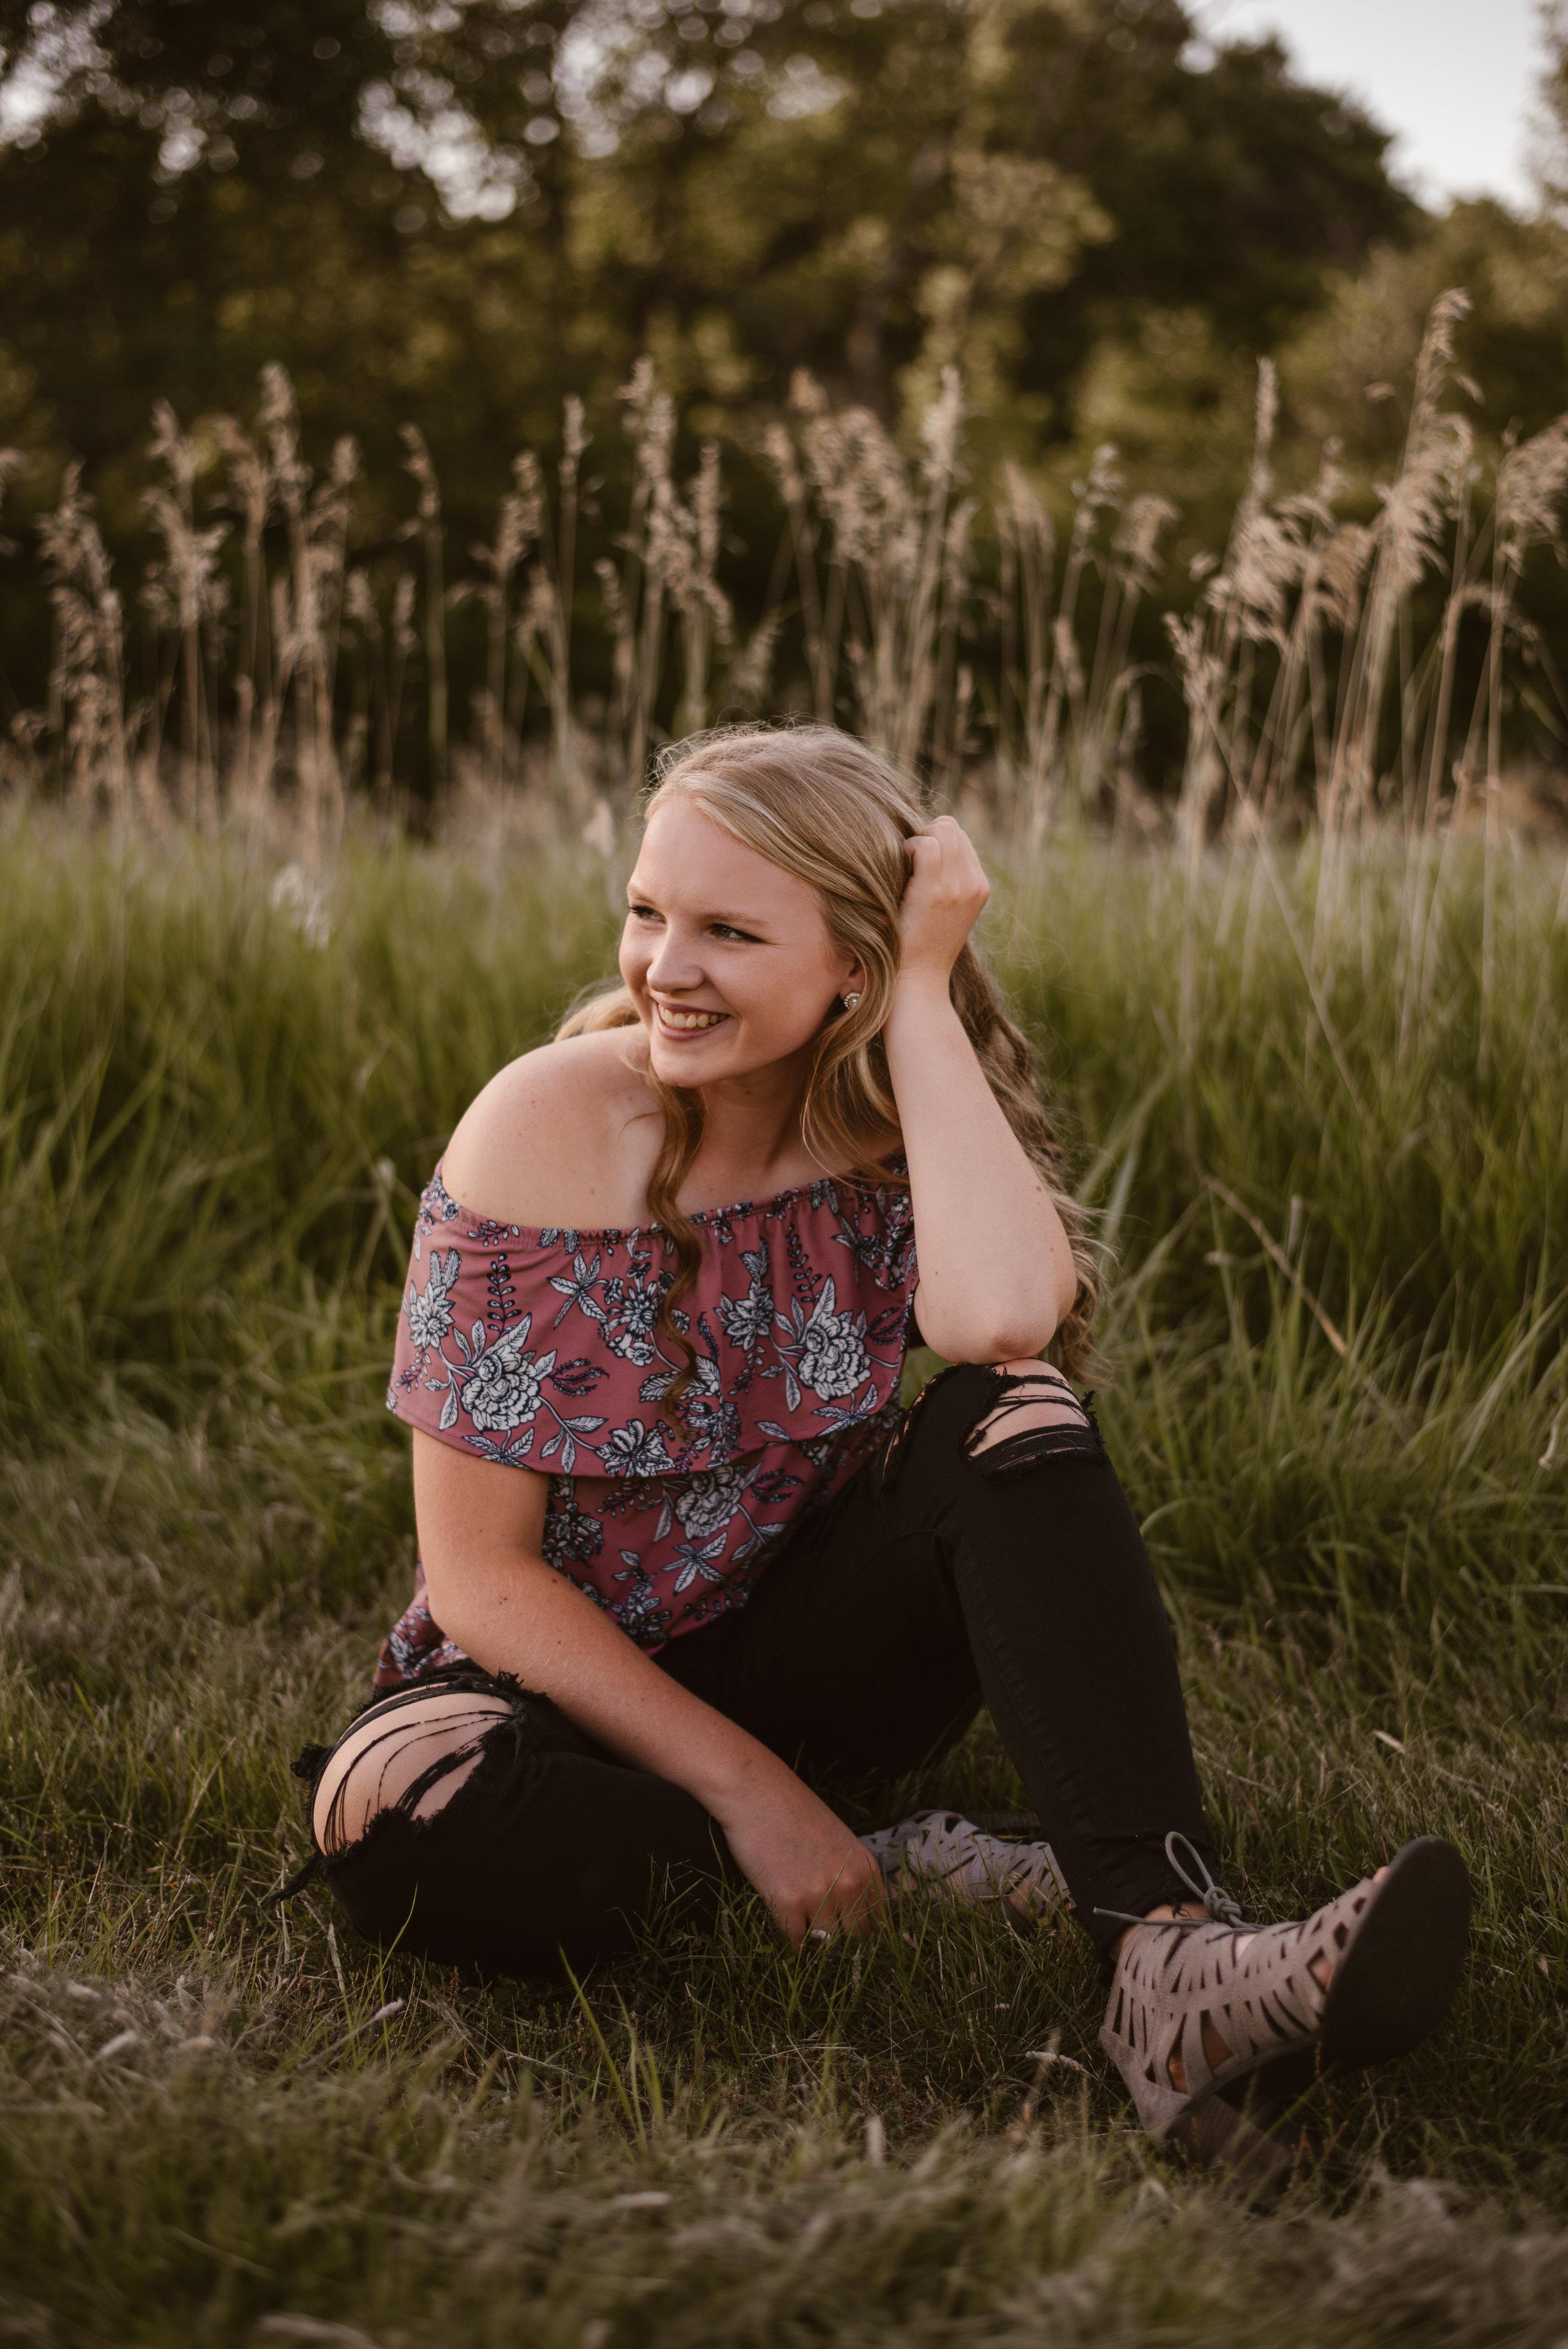 Kaylie-Sirek-Photography-Grand-Island-Nebraska-Senior-008.jpg